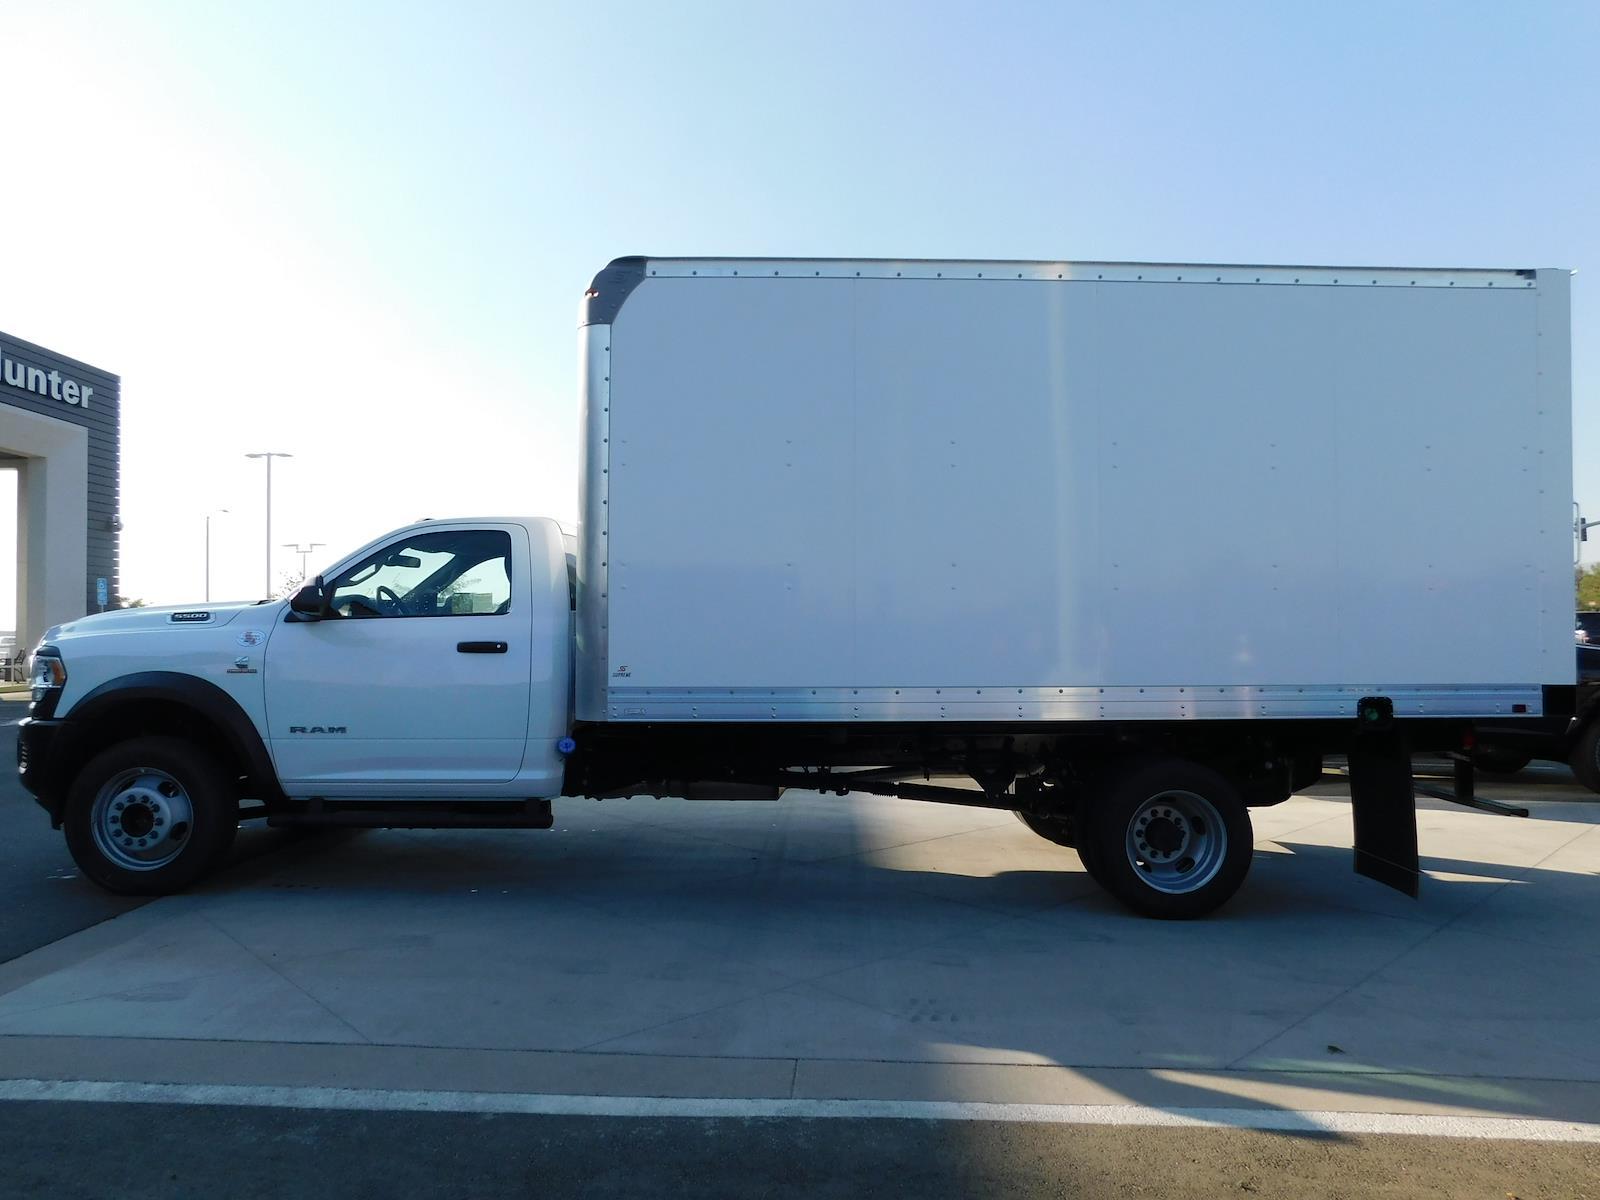 2020 Ram 5500 Regular Cab DRW 4x2, Dry Freight #XCC54466 - photo 1